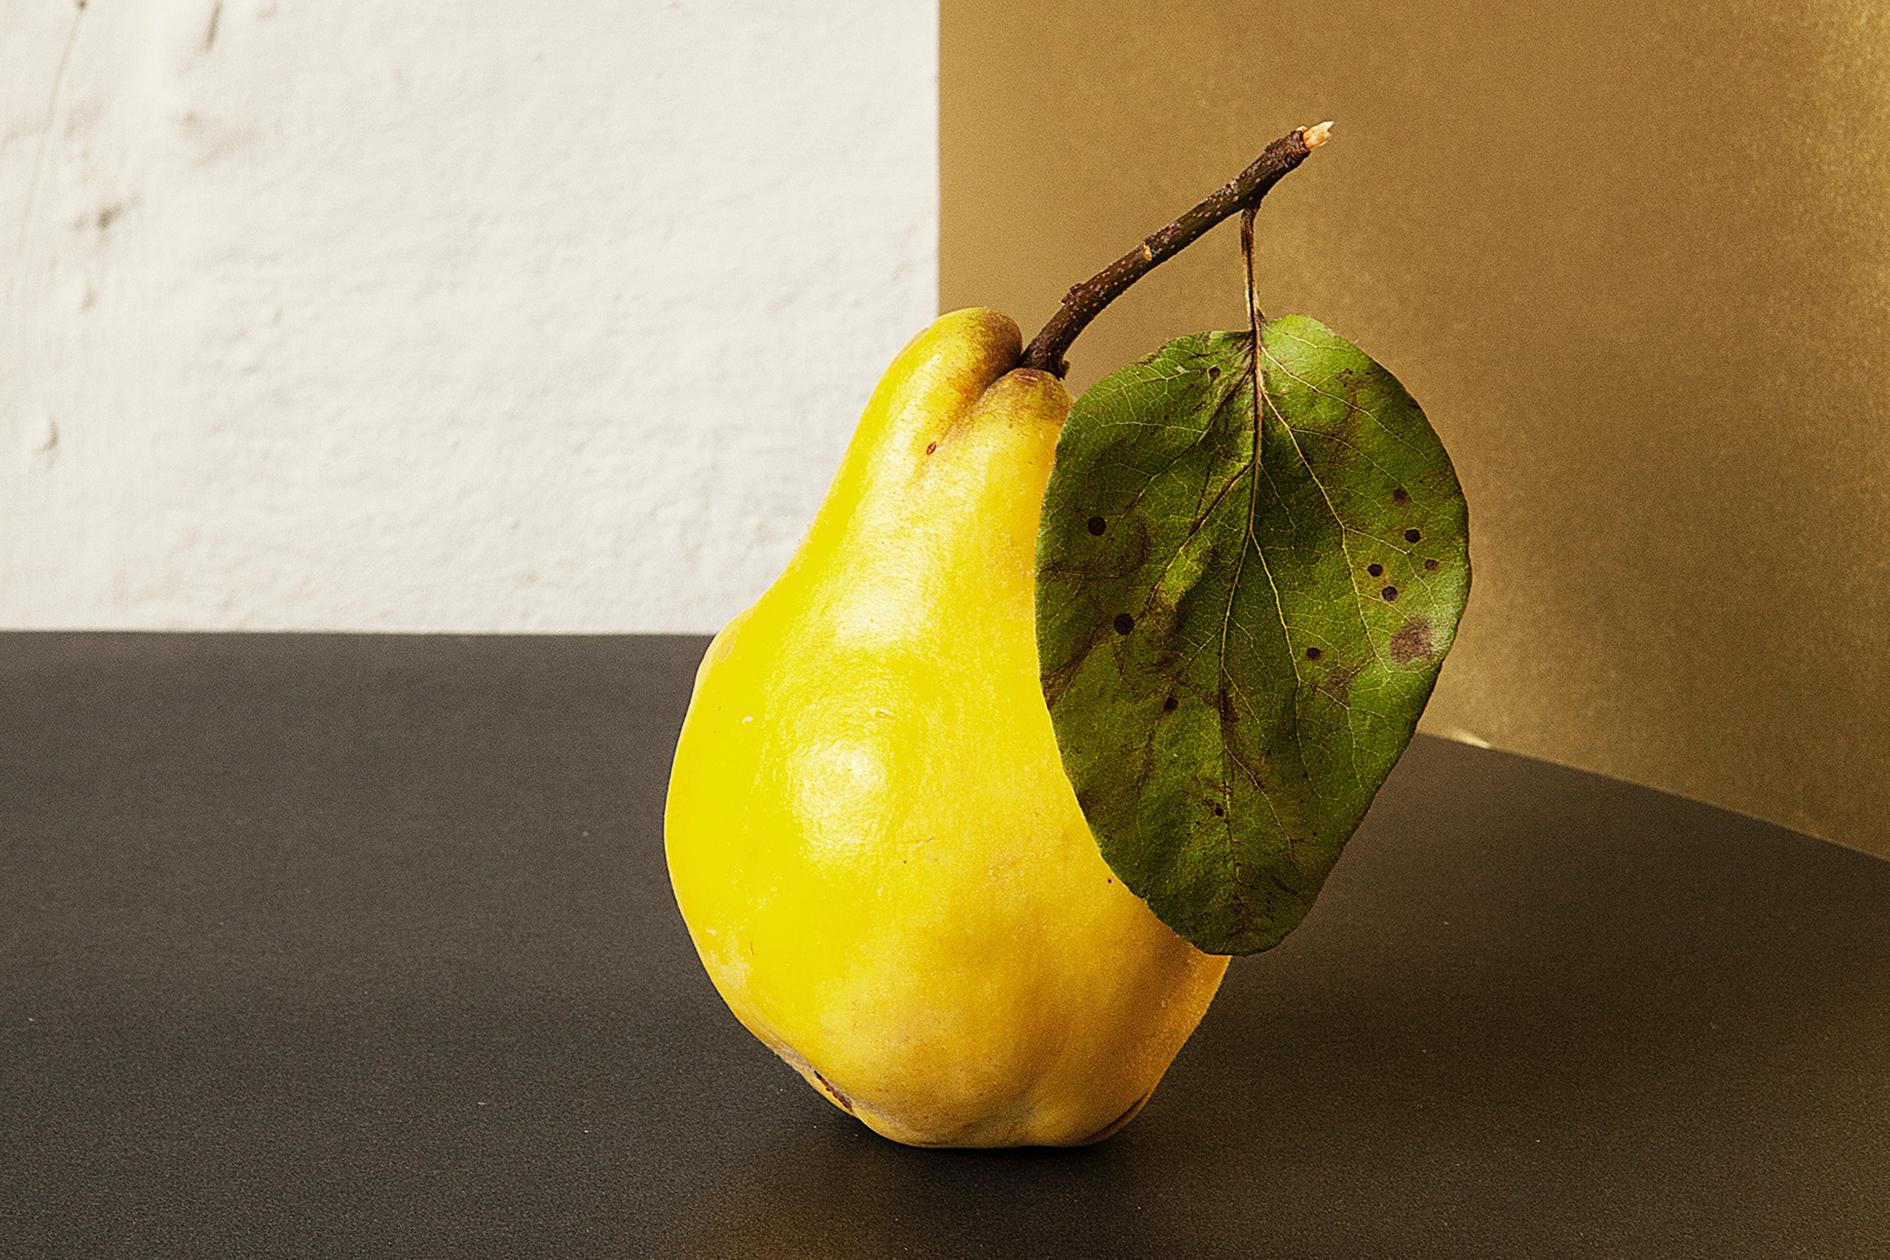 jason-b-graham-produce-quince-avya